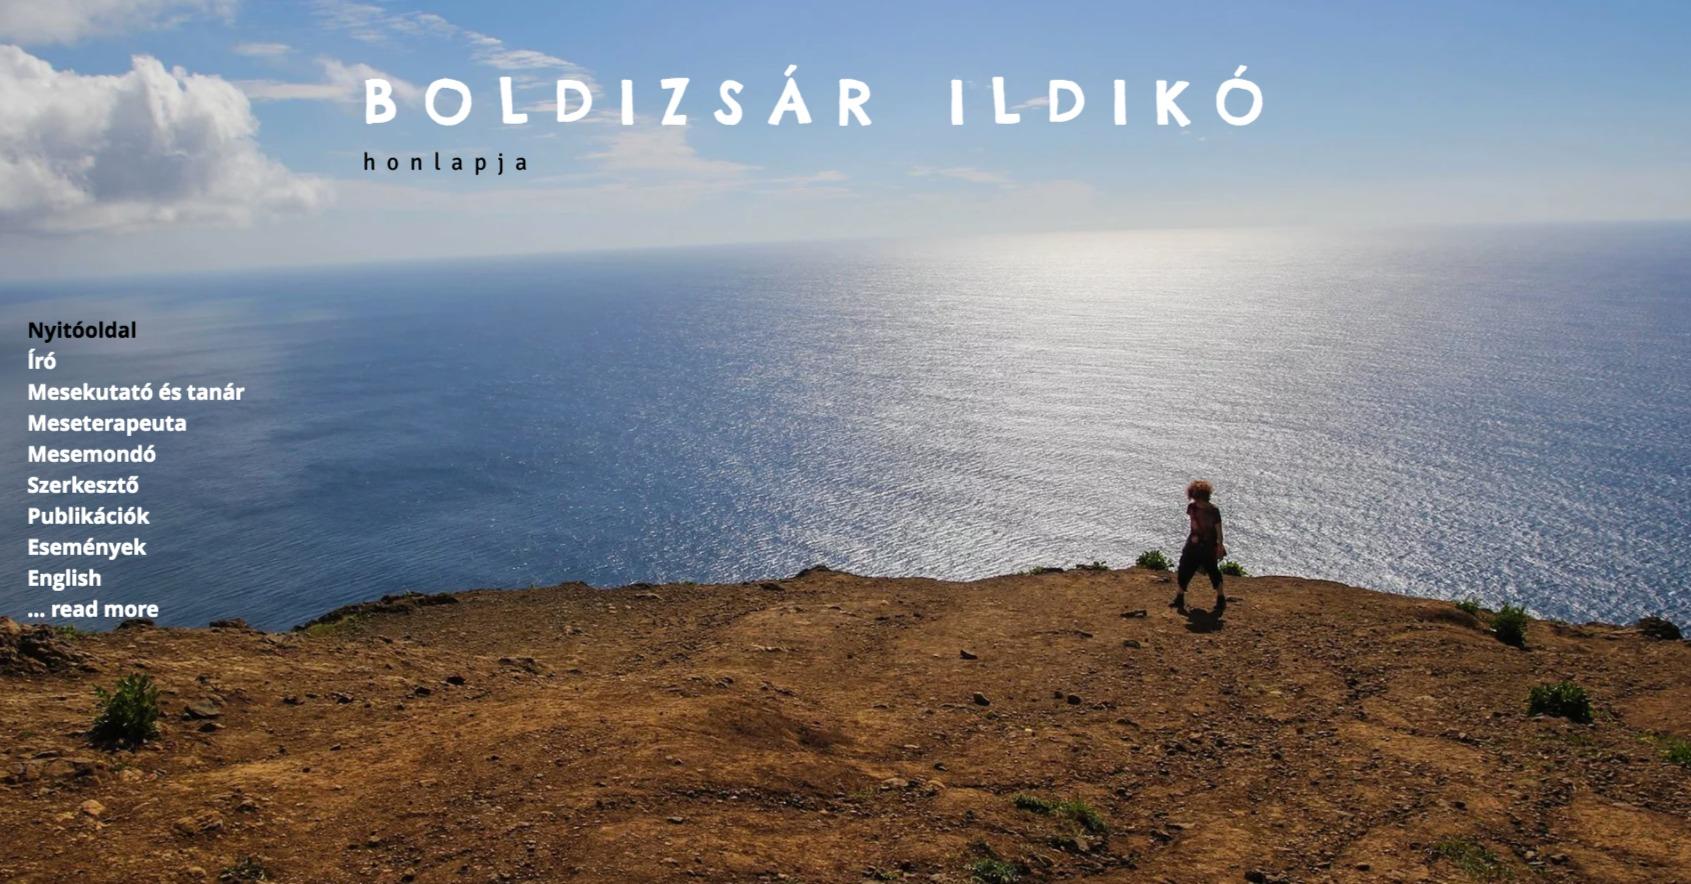 boldizsarildiko.com